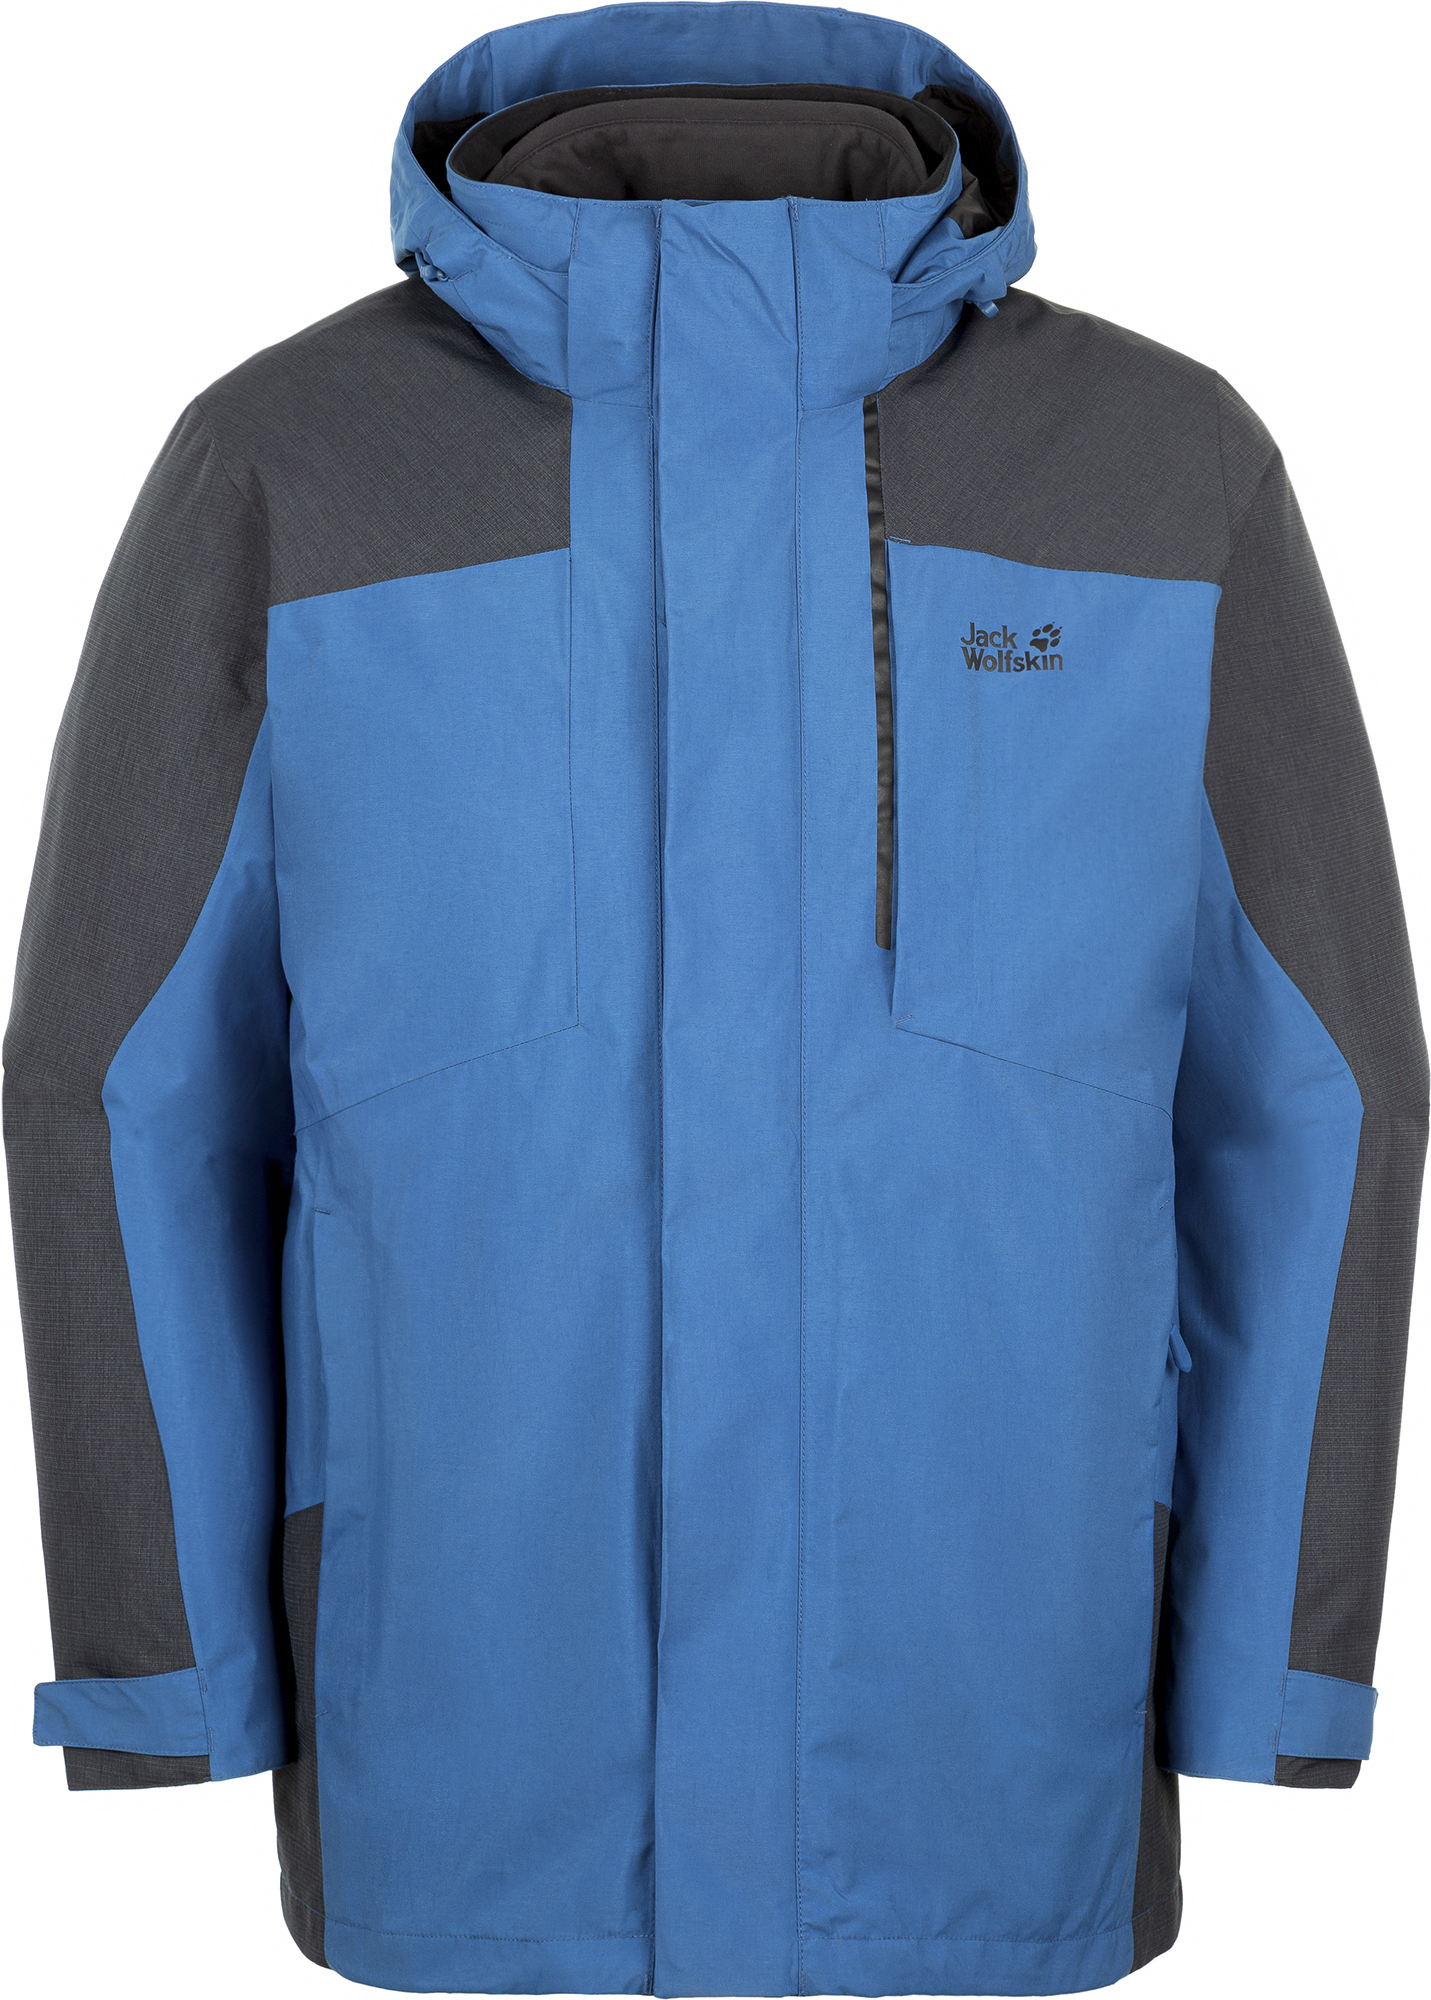 Jack Wolfskin Куртка 3 в 1 мужская Viking, размер 58